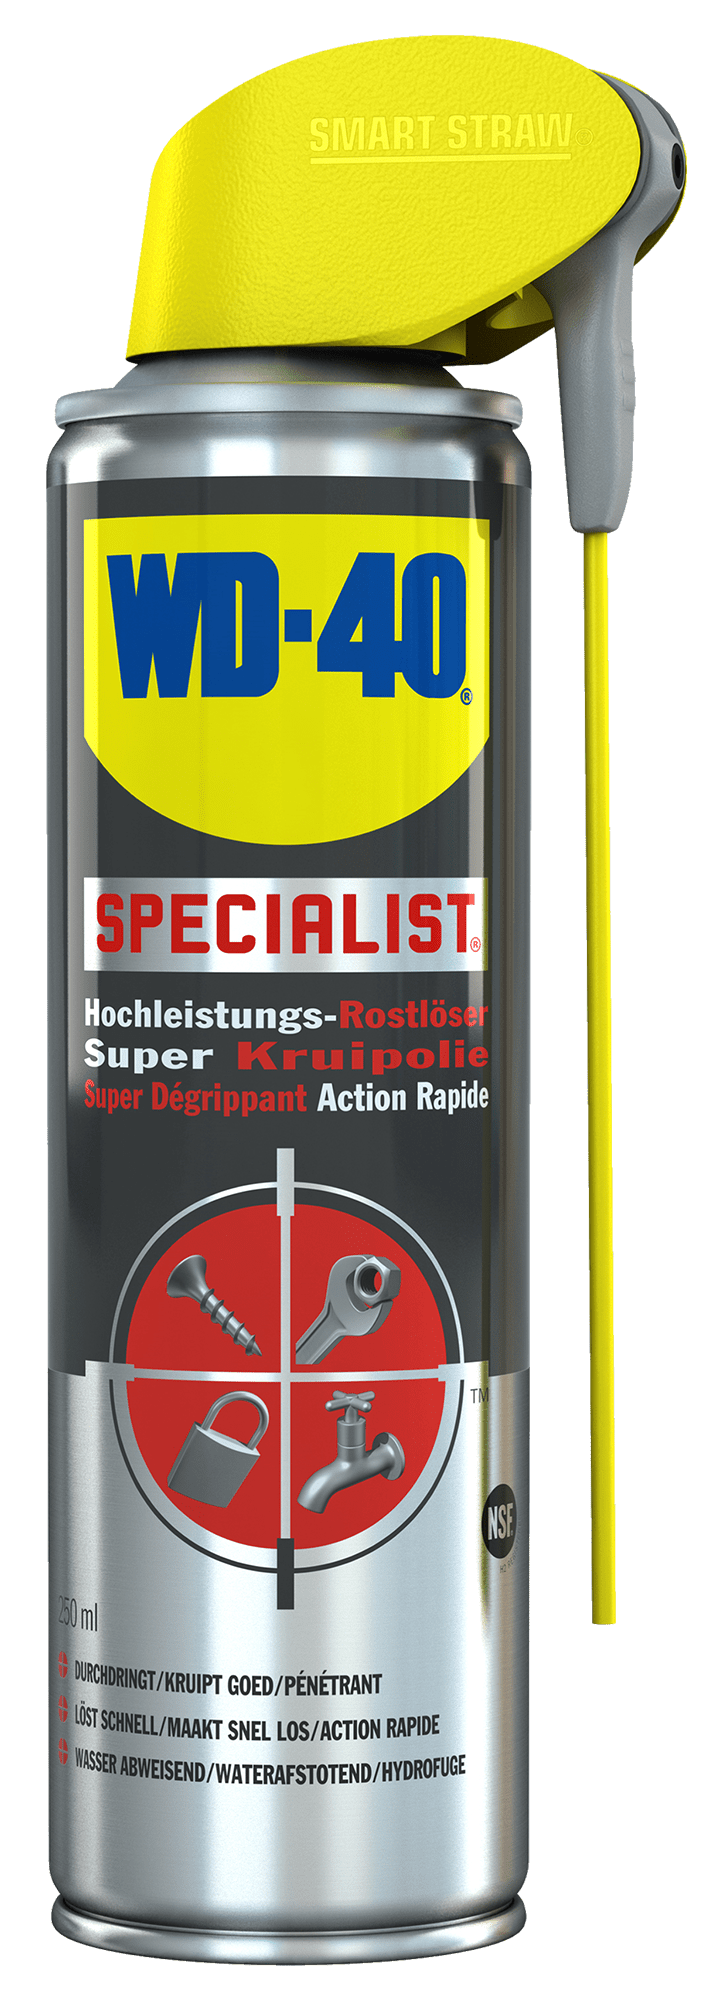 wd40 250ml specialist rostloeser